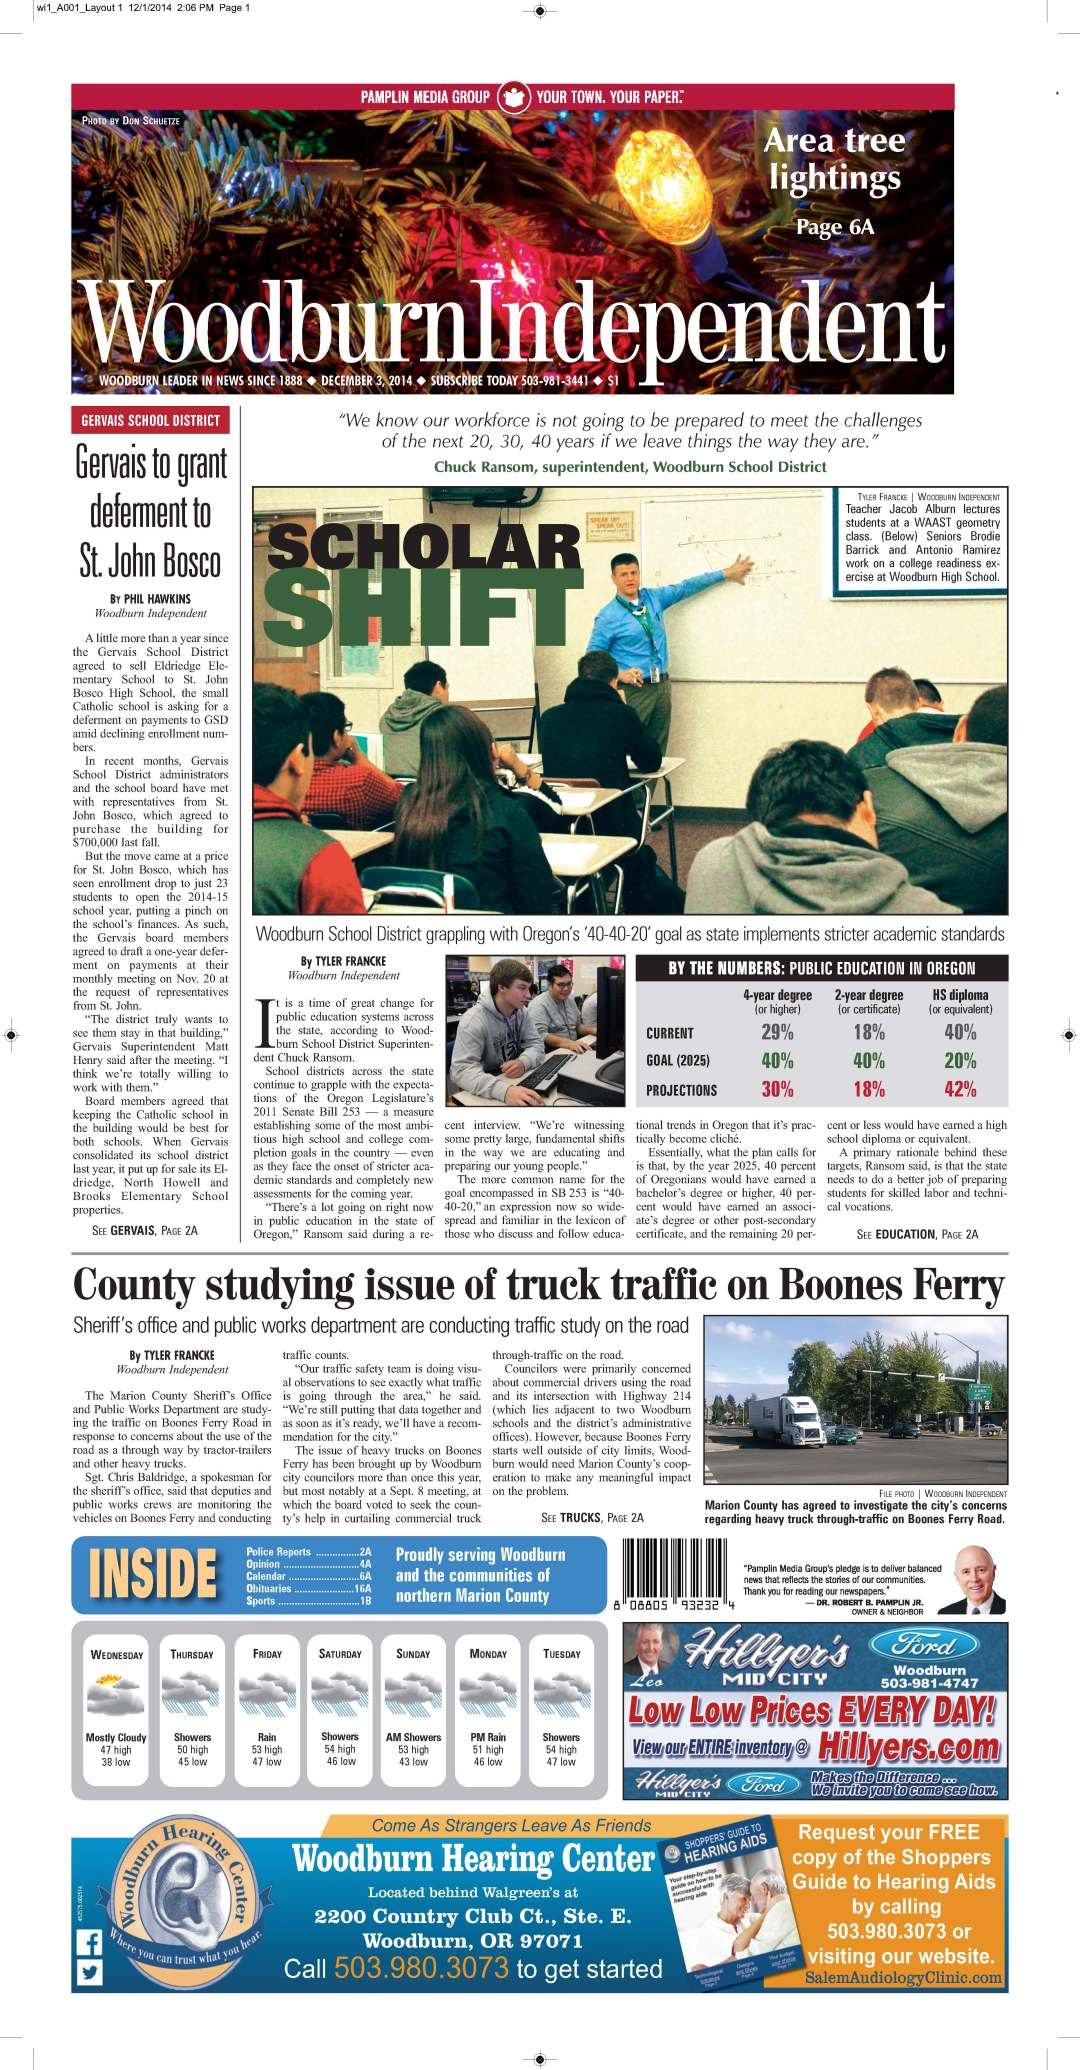 Woodburn Independent | Dec. 3, 2014